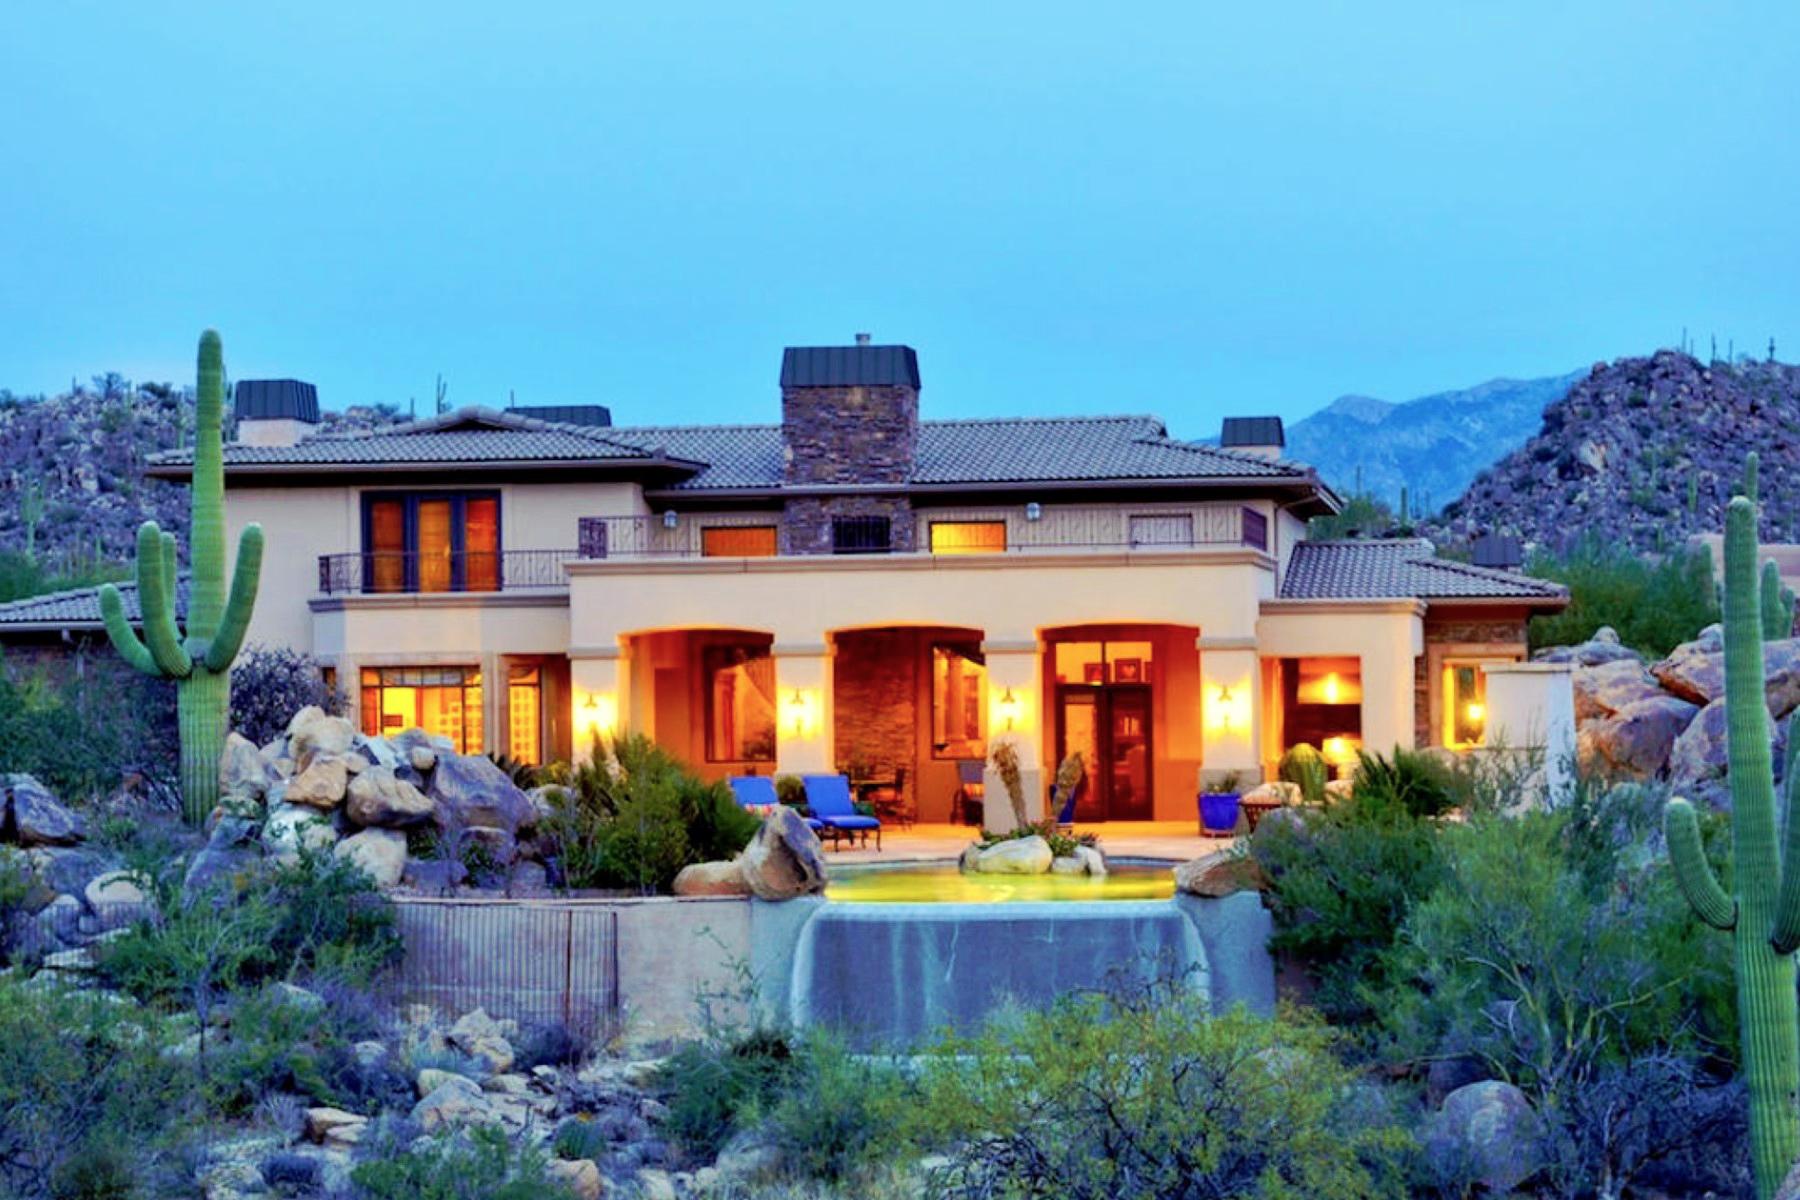 Moradia para Venda às Exquisite Mediterranean Home in th Exclusive Golf Community of Stone Canyon 1214 W Tortolita Mountain Circle Oro Valley, Arizona 85755 Estados Unidos